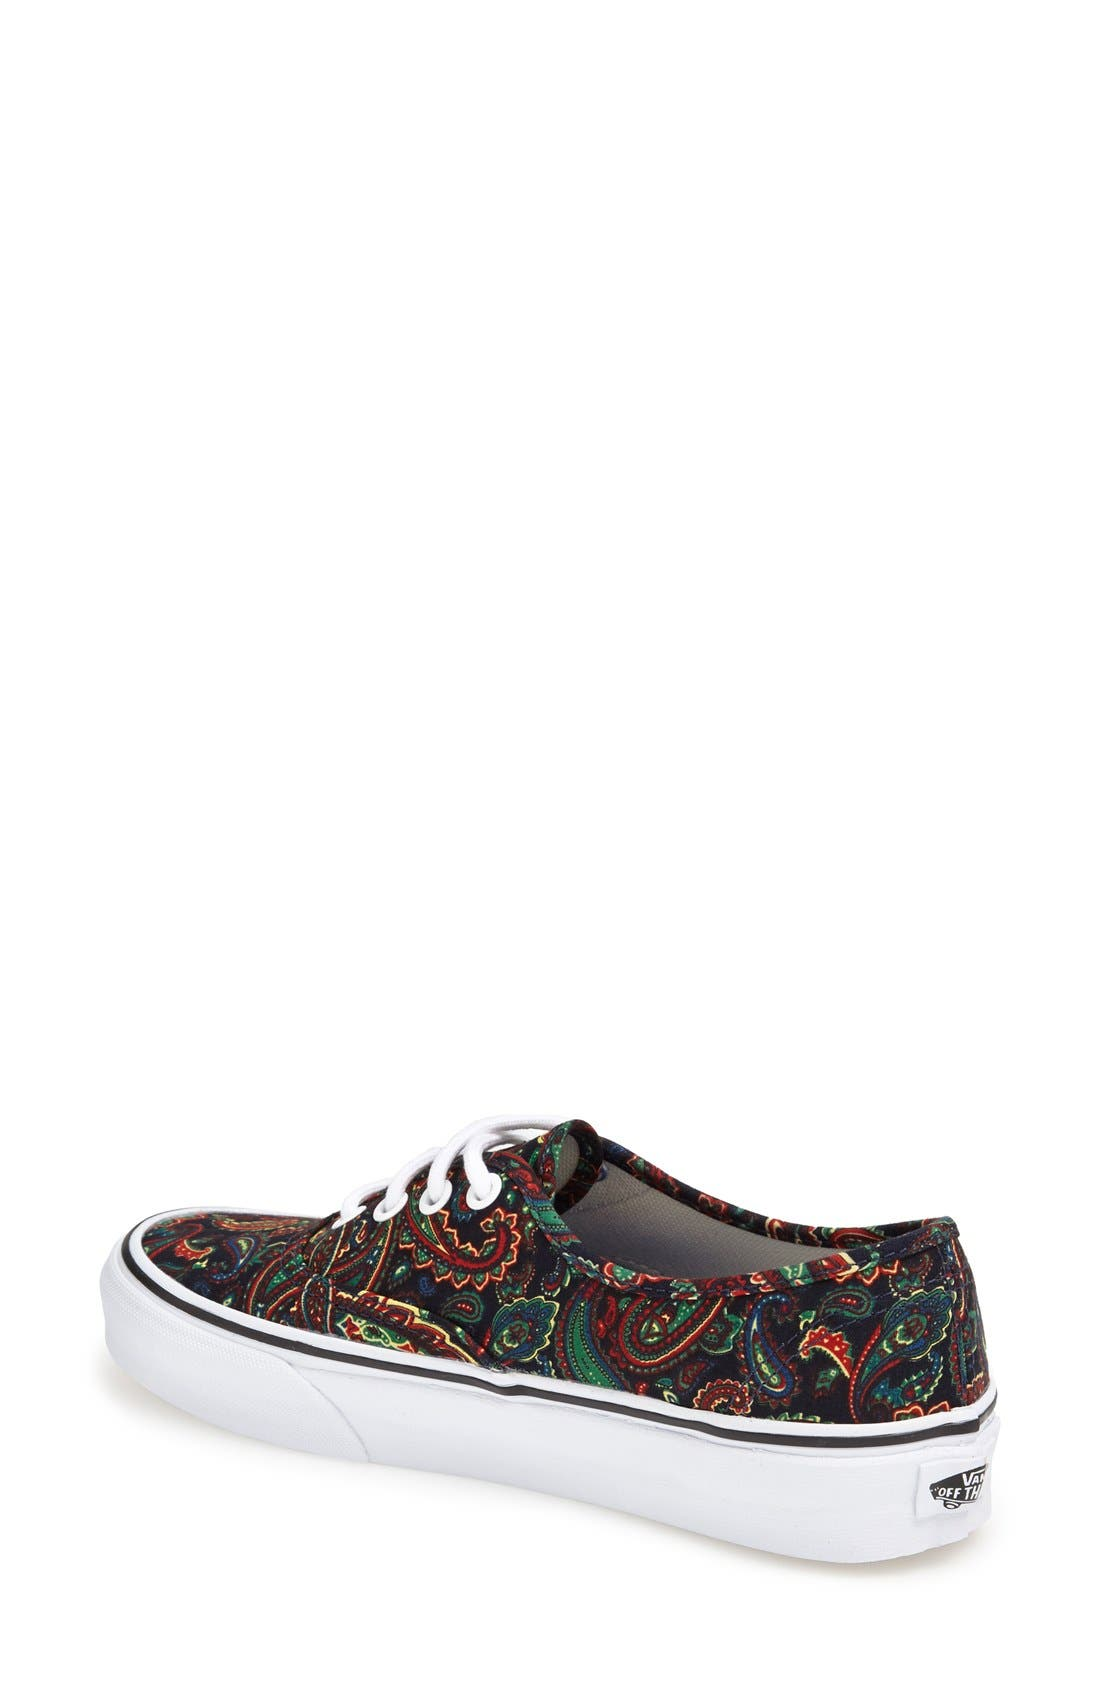 Alternate Image 2  - Vans Authentic Paisley Print Sneaker (Women)